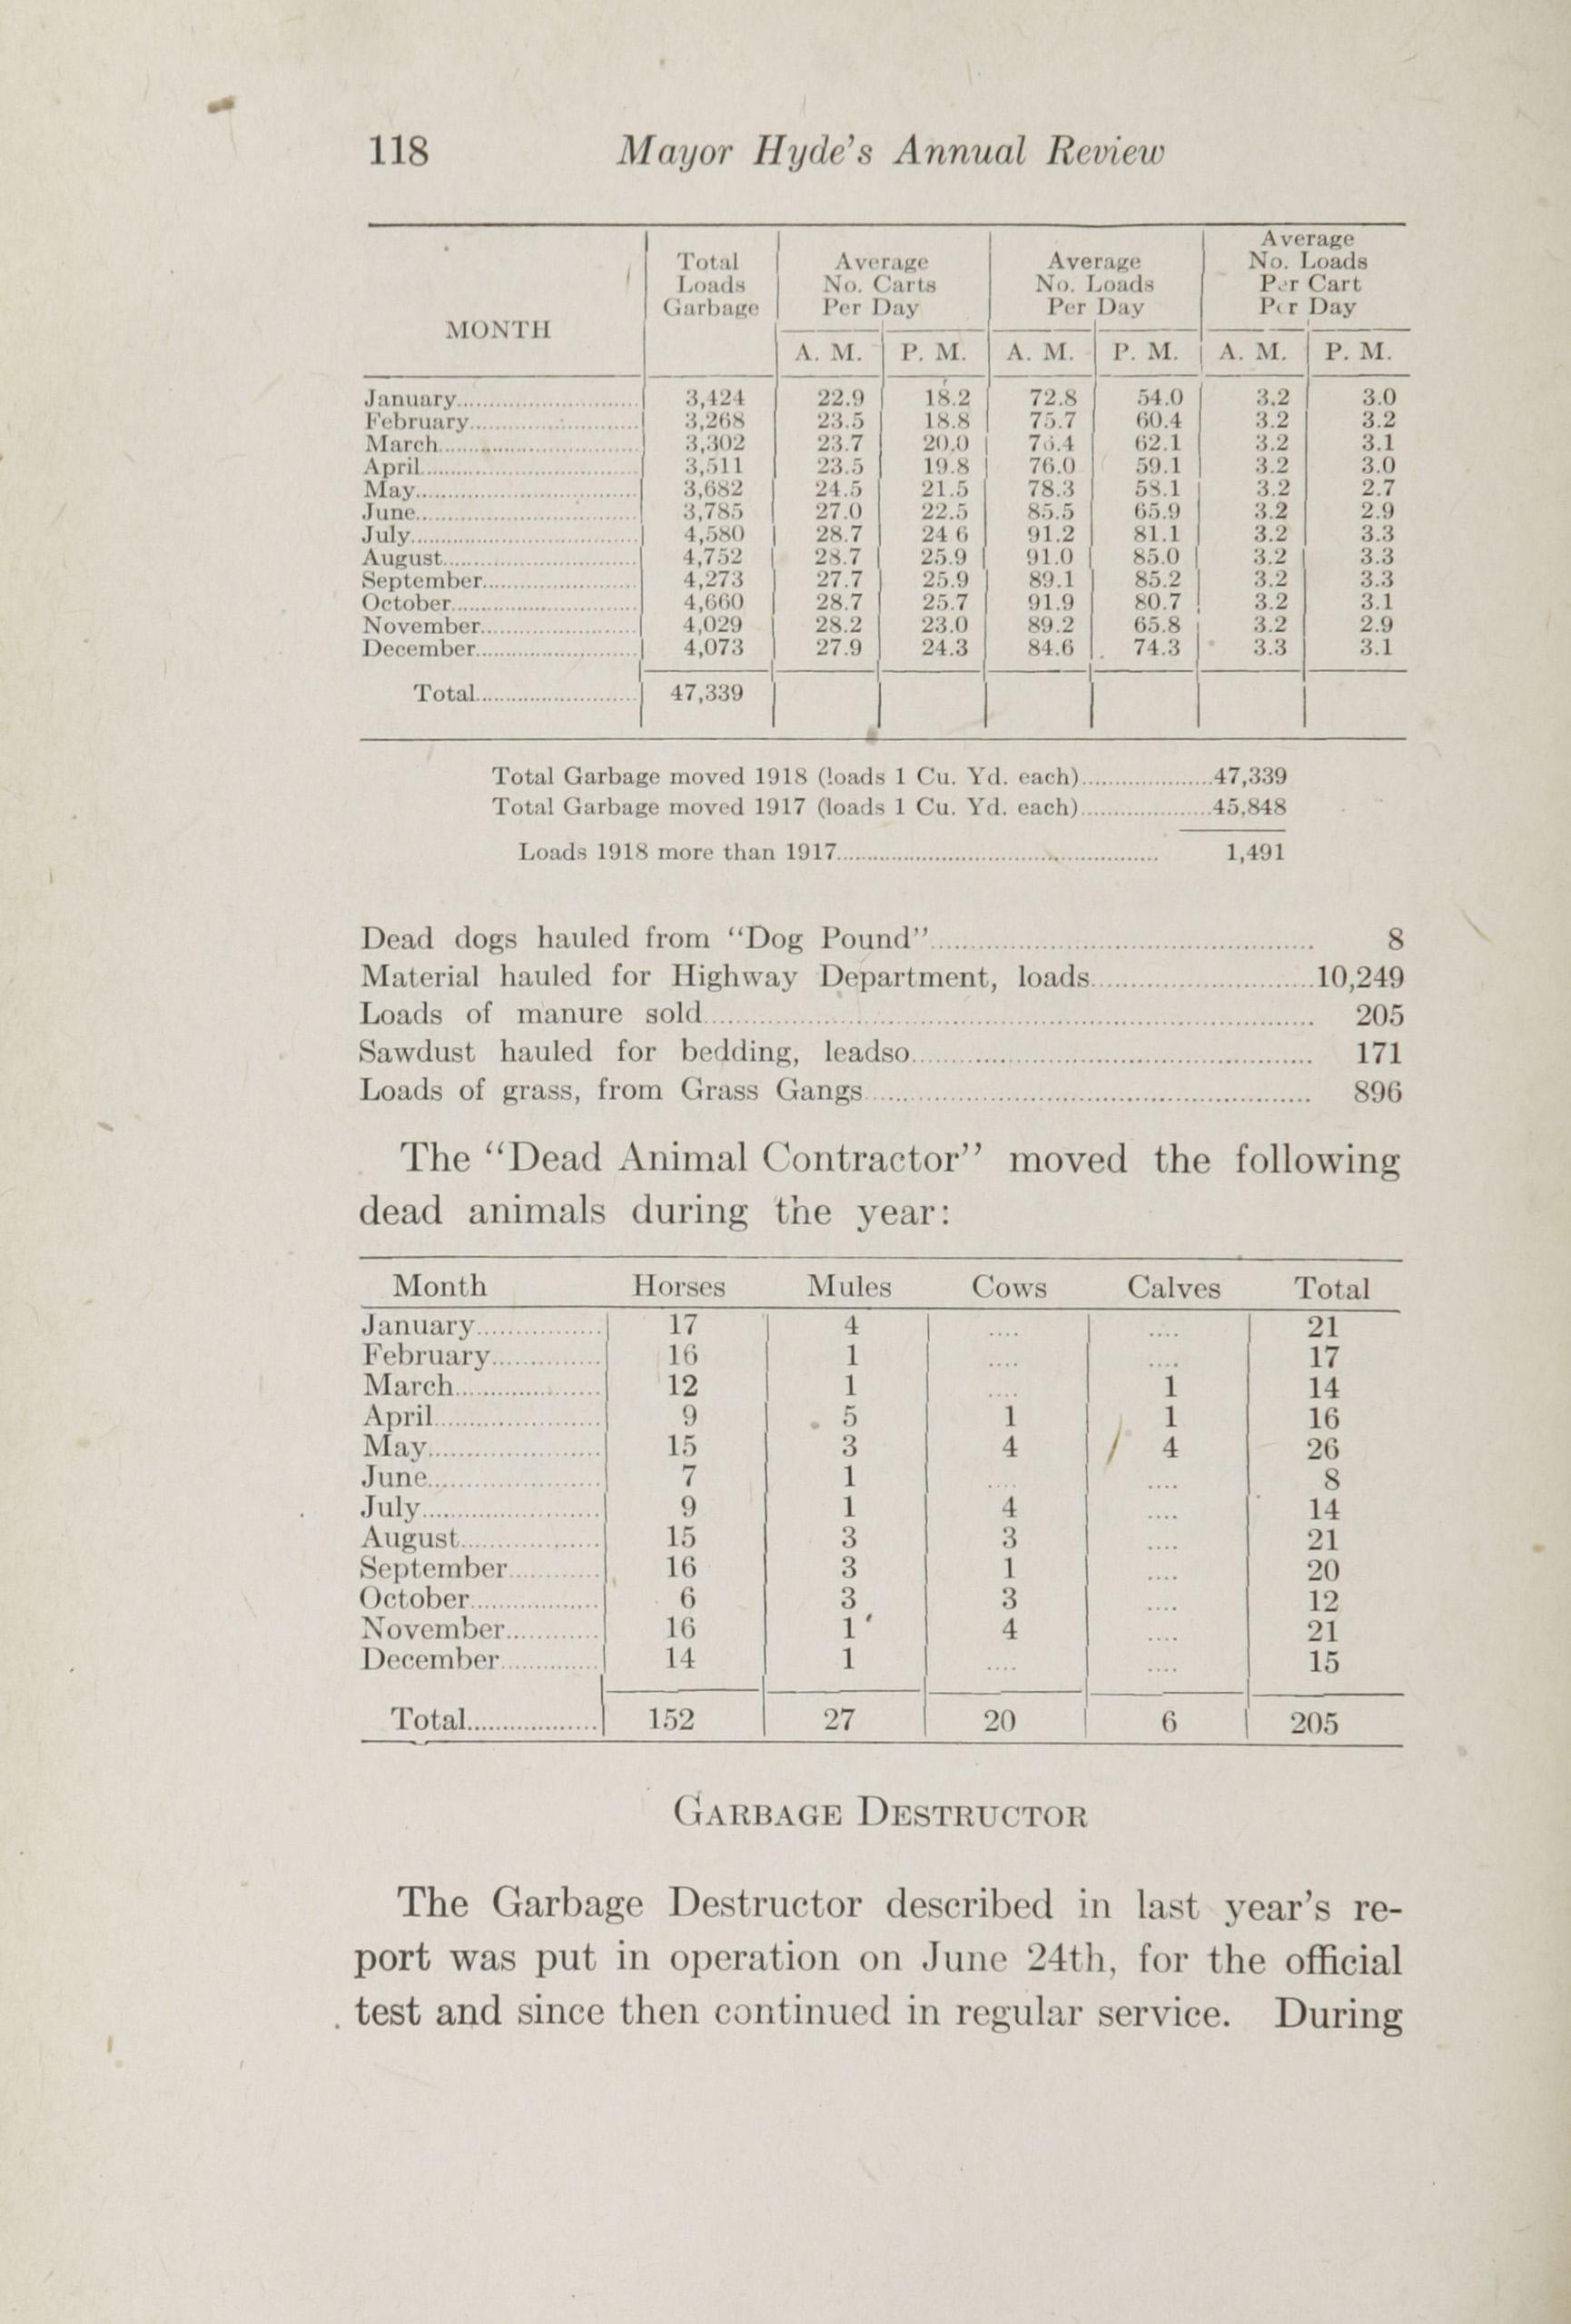 Charleston Yearbook, 1918, page 118